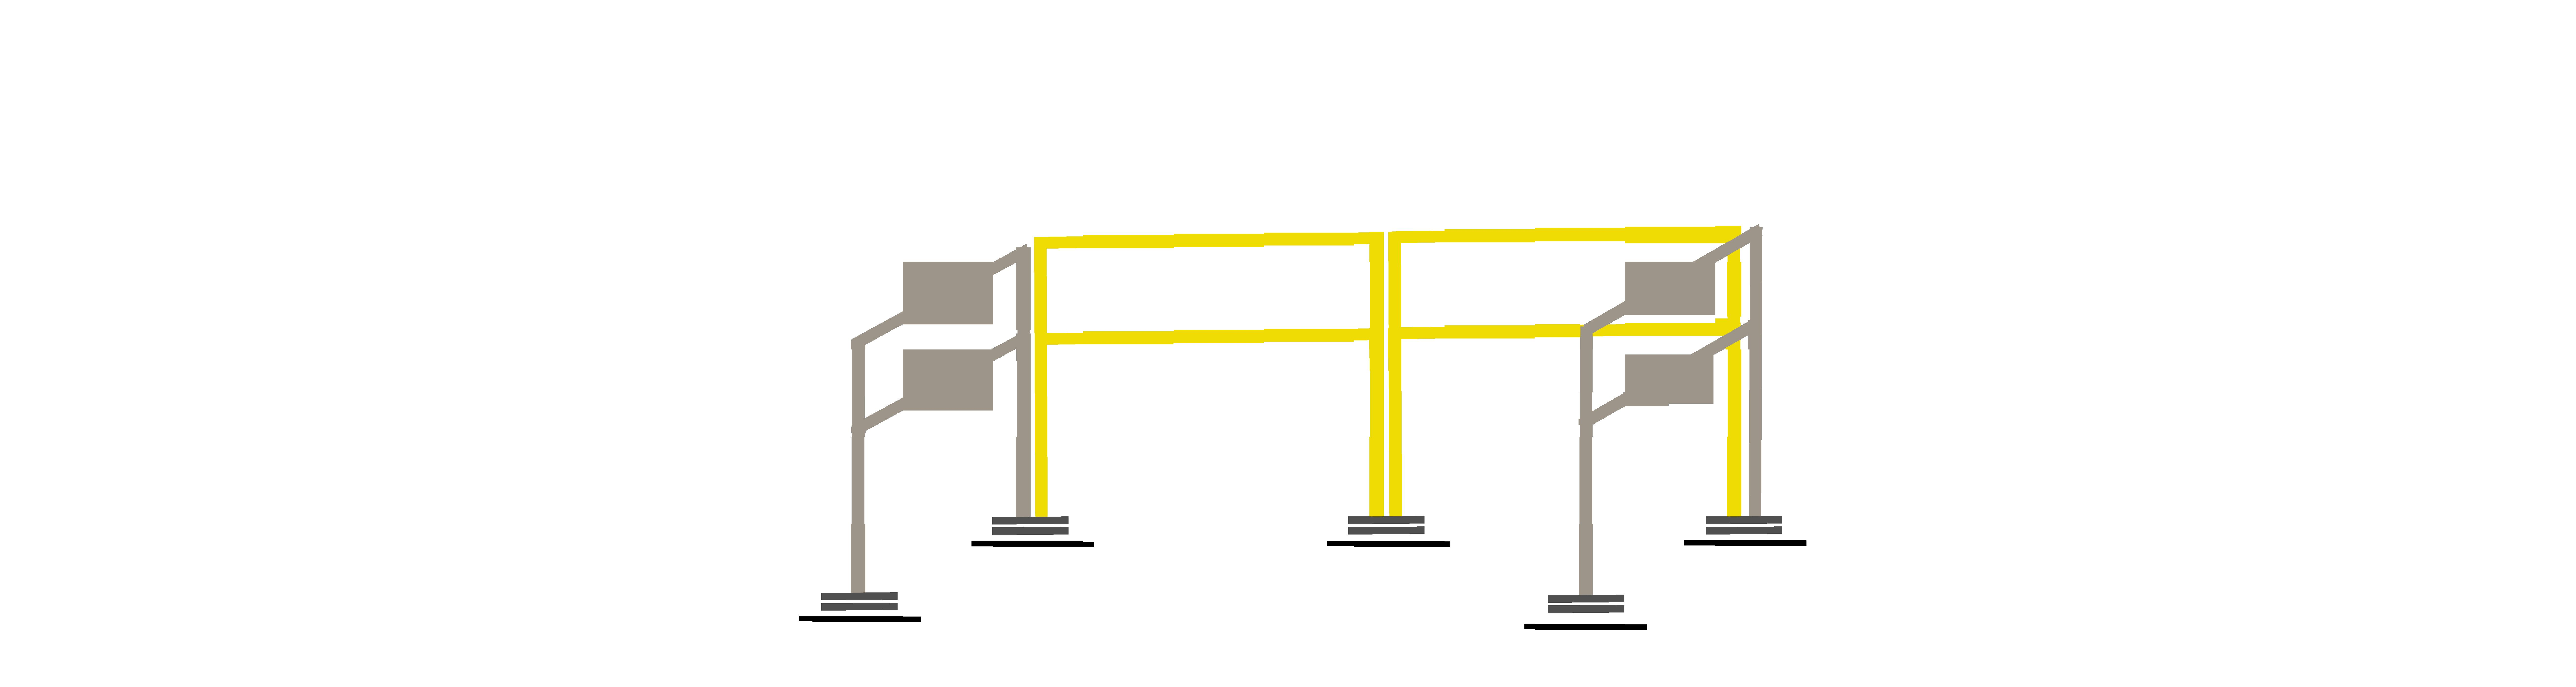 16 foot rooftop guardrail